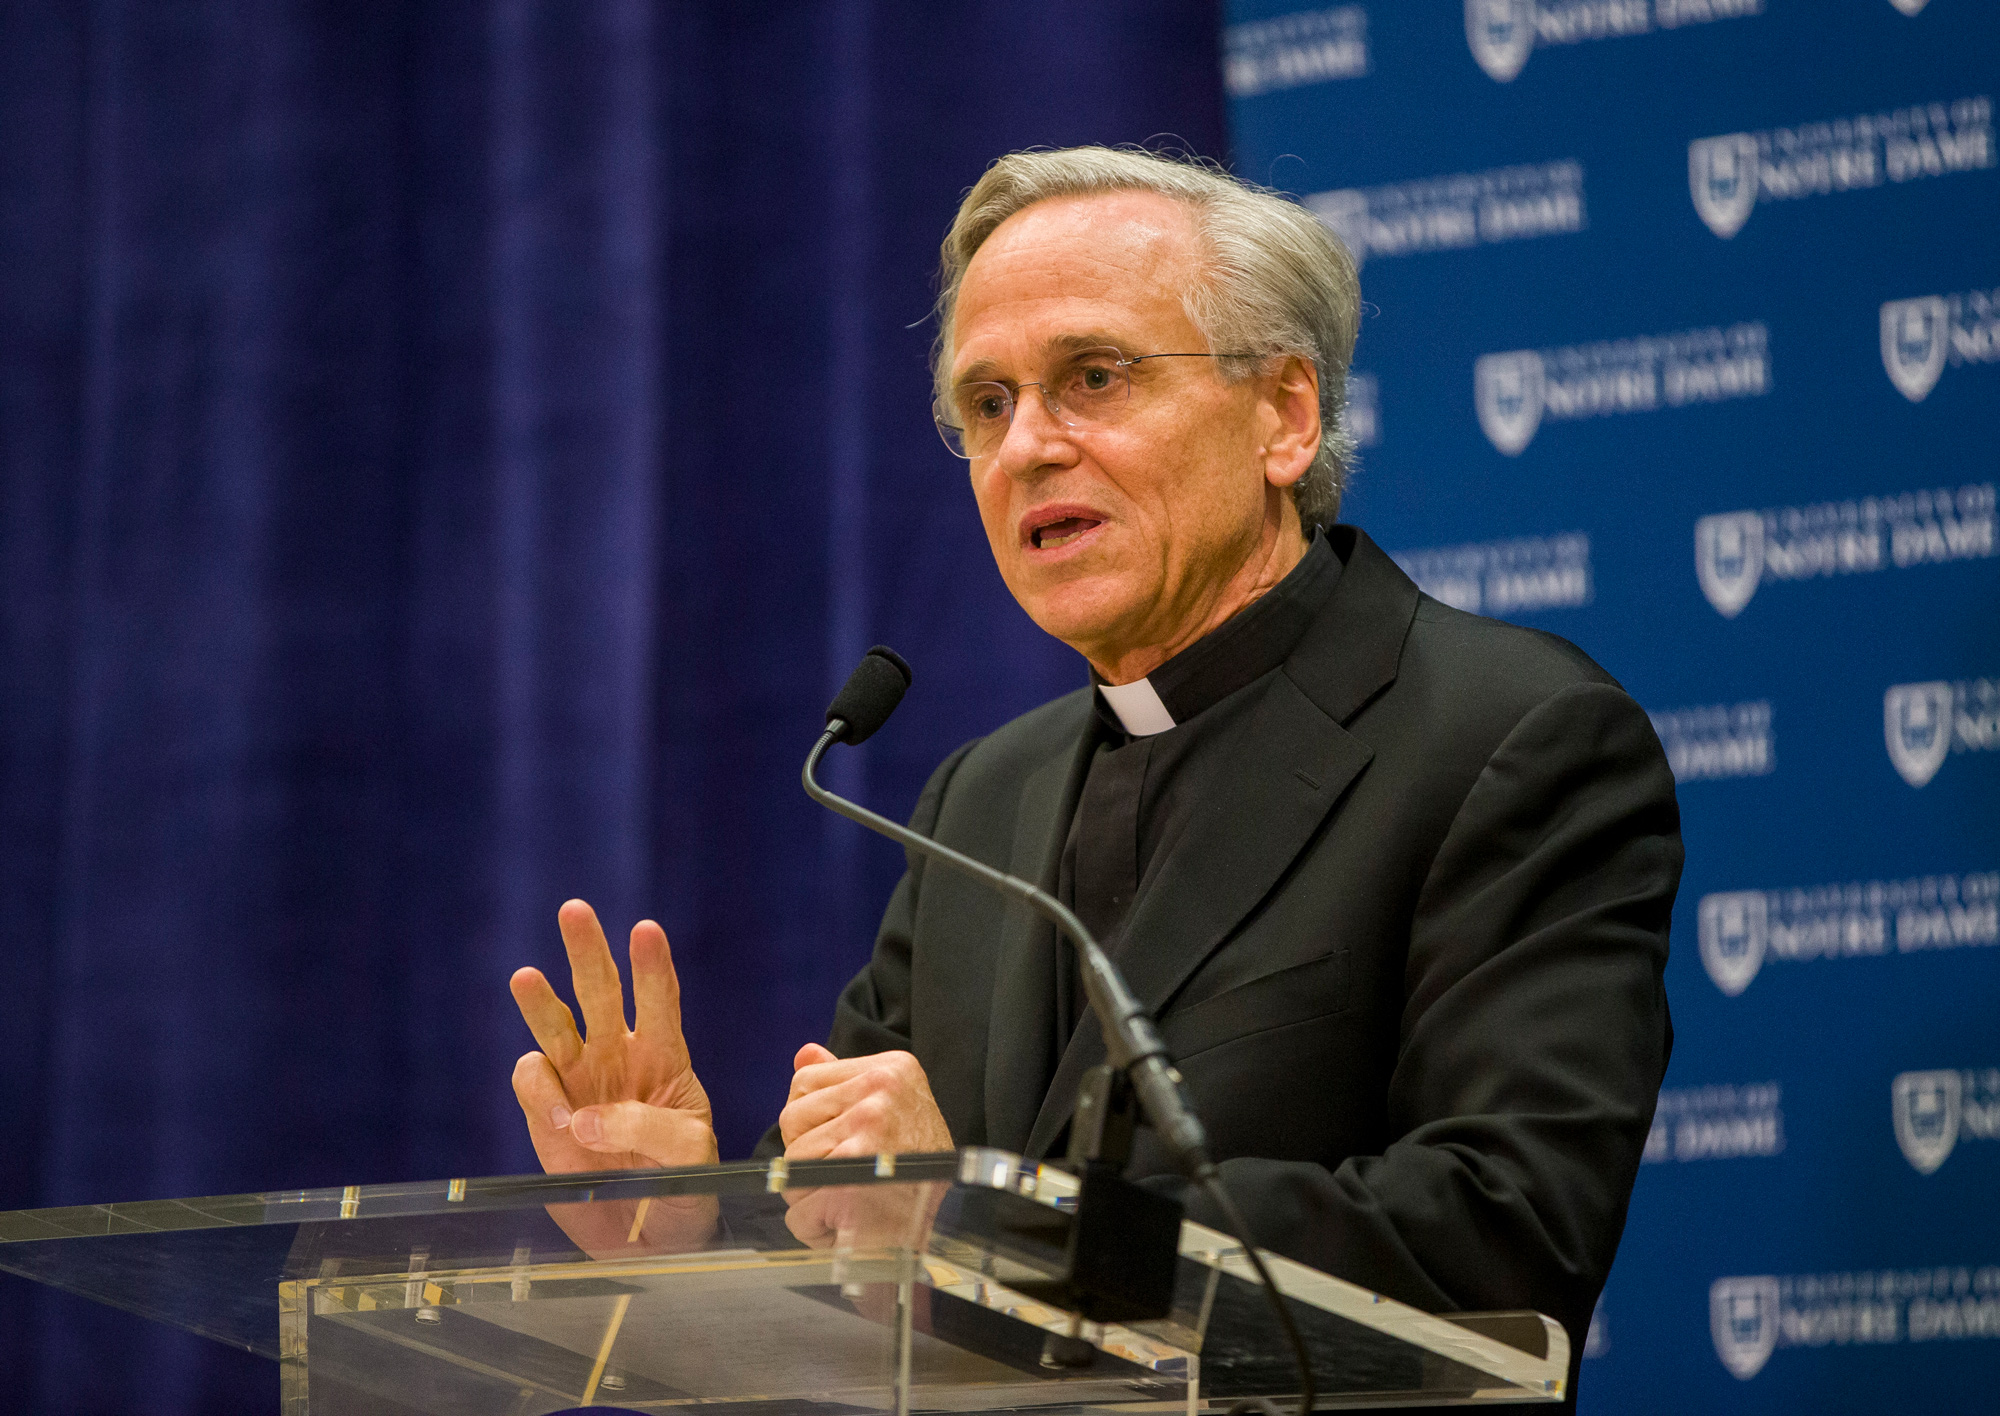 University of Notre Dame President Rev. John I. Jenkins speaks during a press conference on October 11, 2019, inside the Morris Inn at the Notre Dame in South Bend, Indiana.